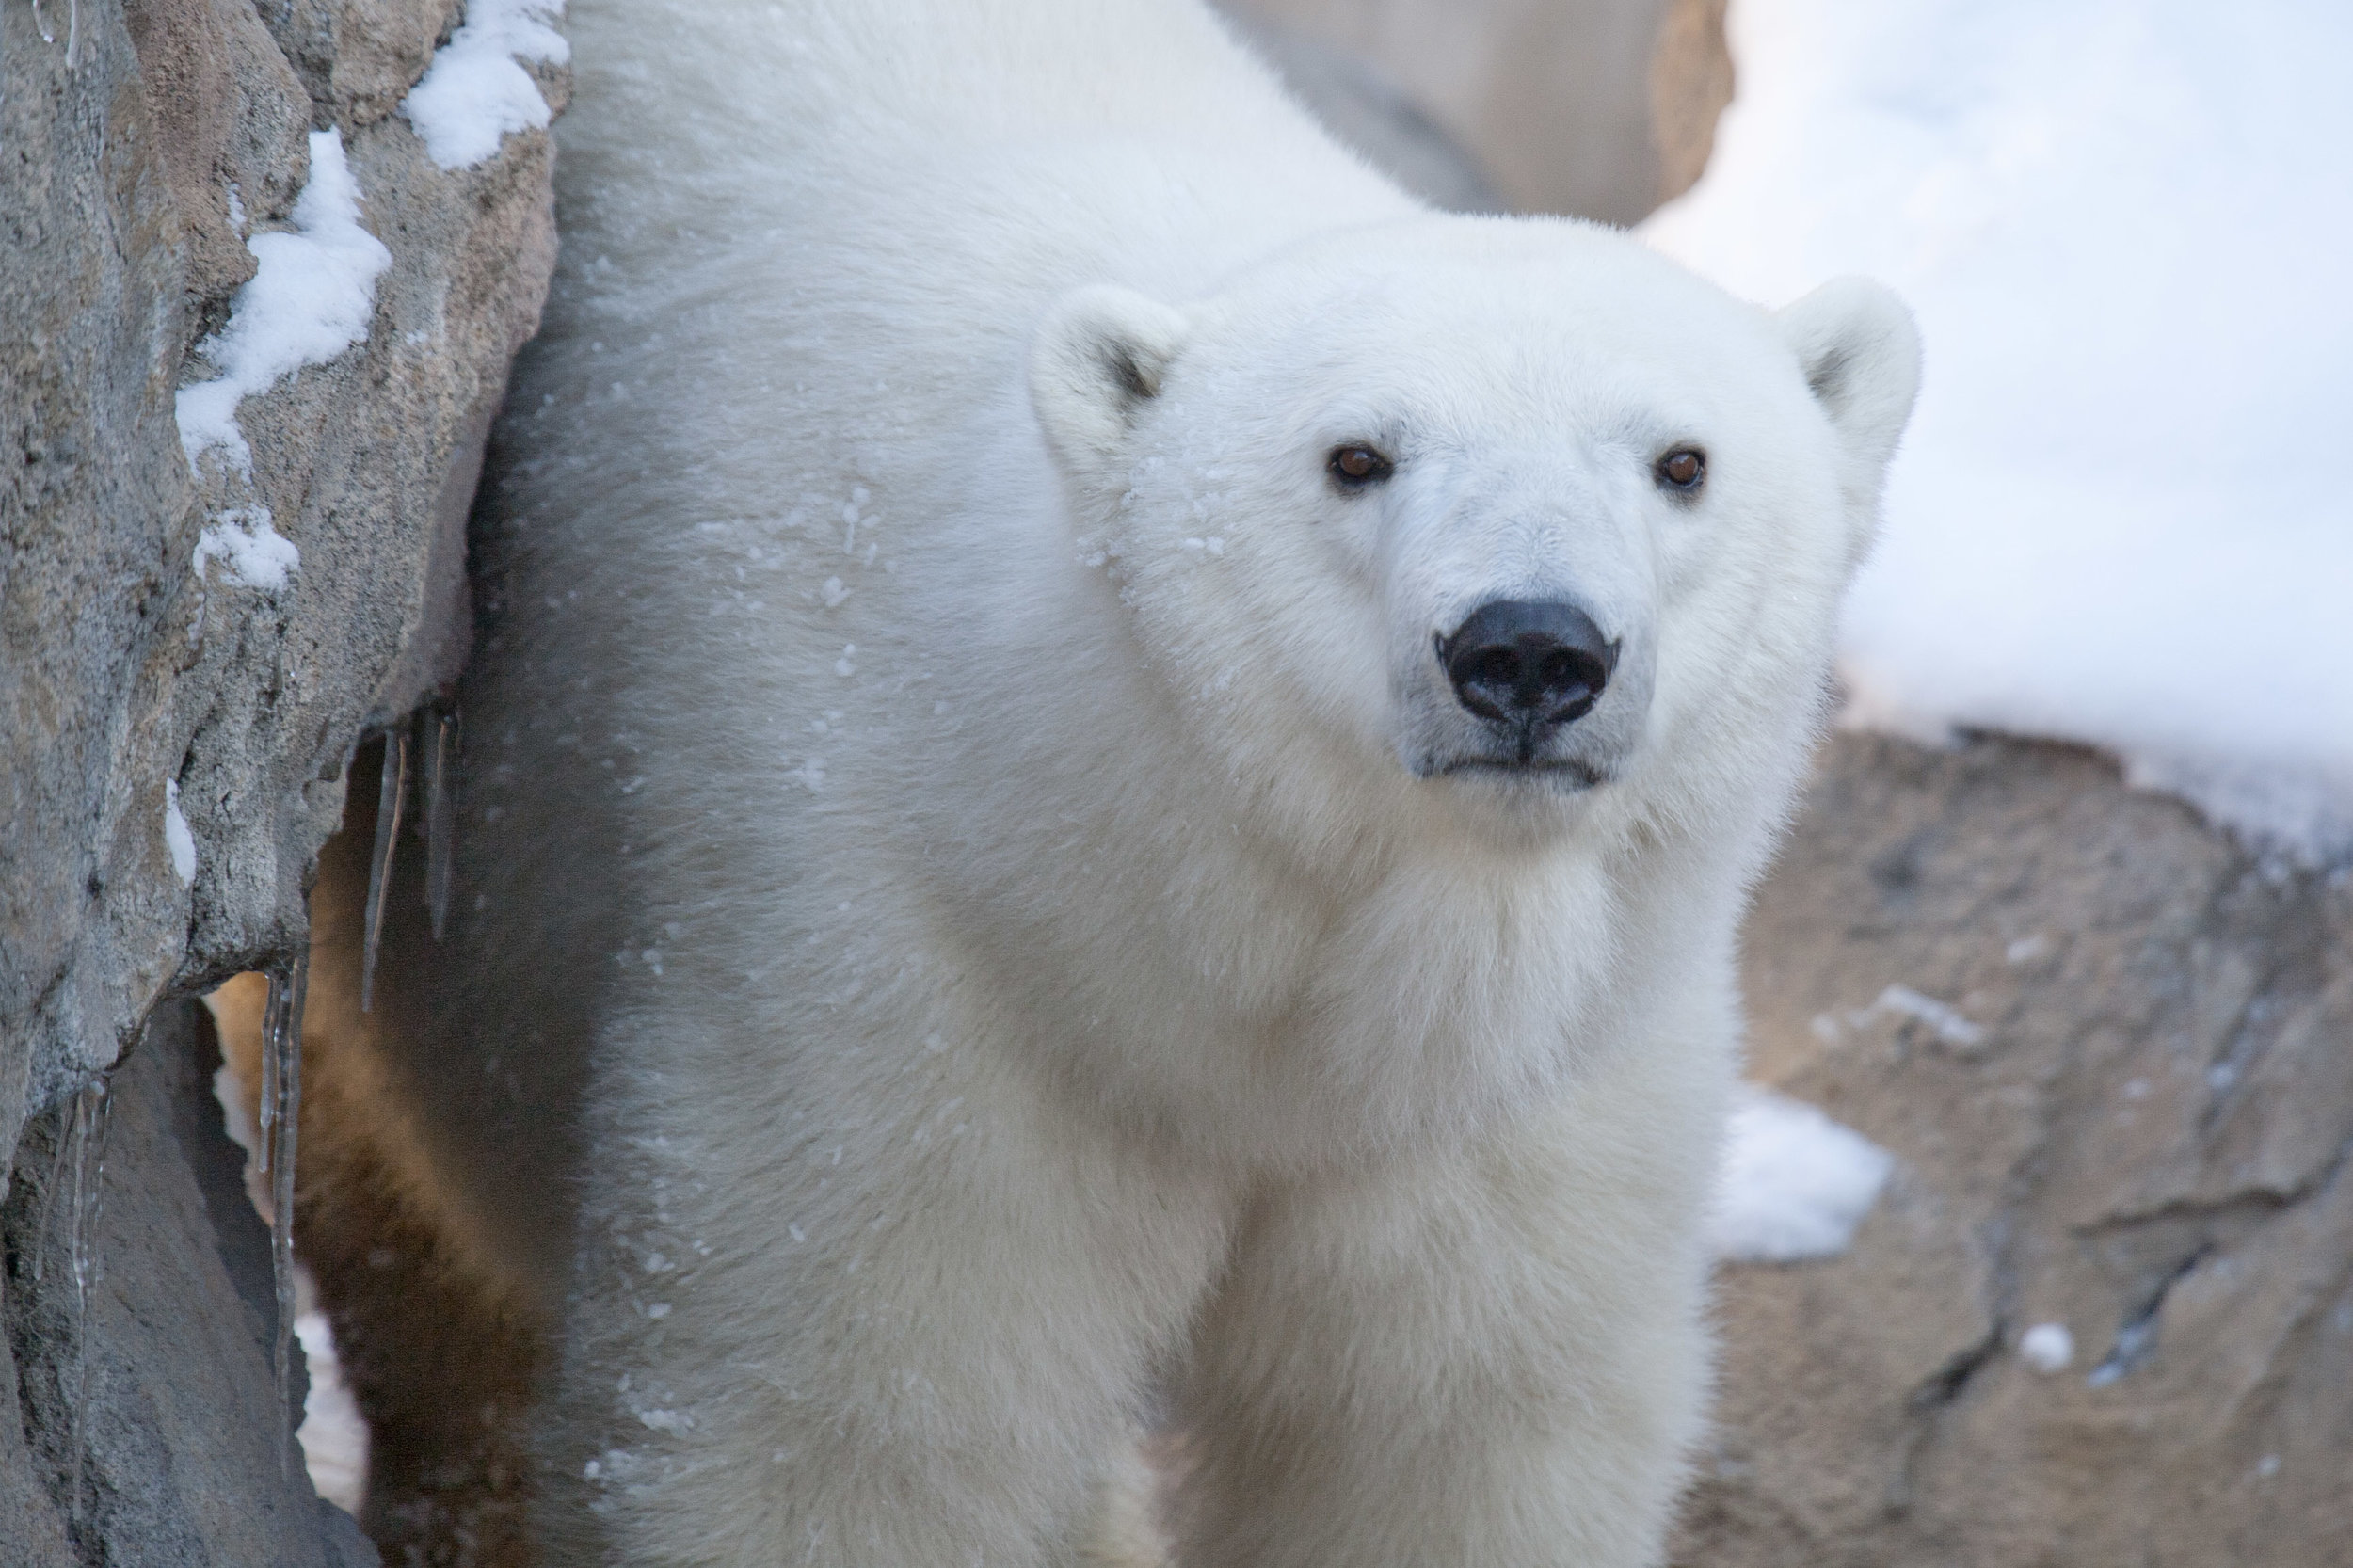 Image of Cranbeary courtesy of Denver Zoo.